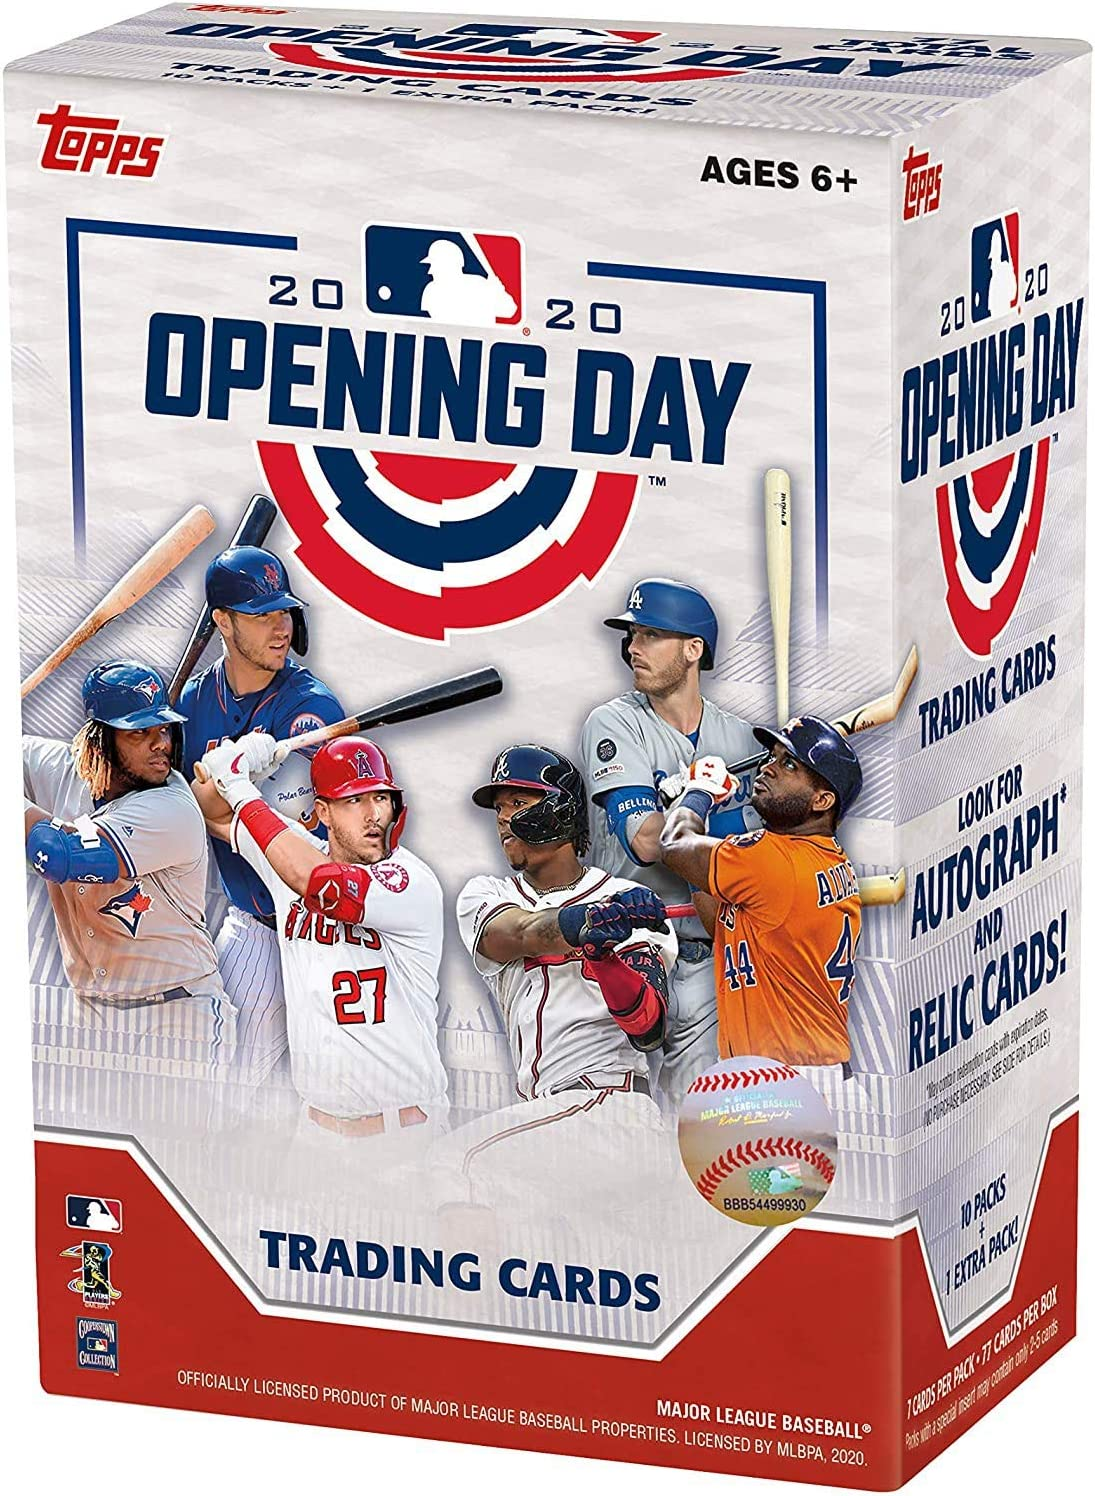 2020 Caja de béisbol Hobby Topps Opening Day